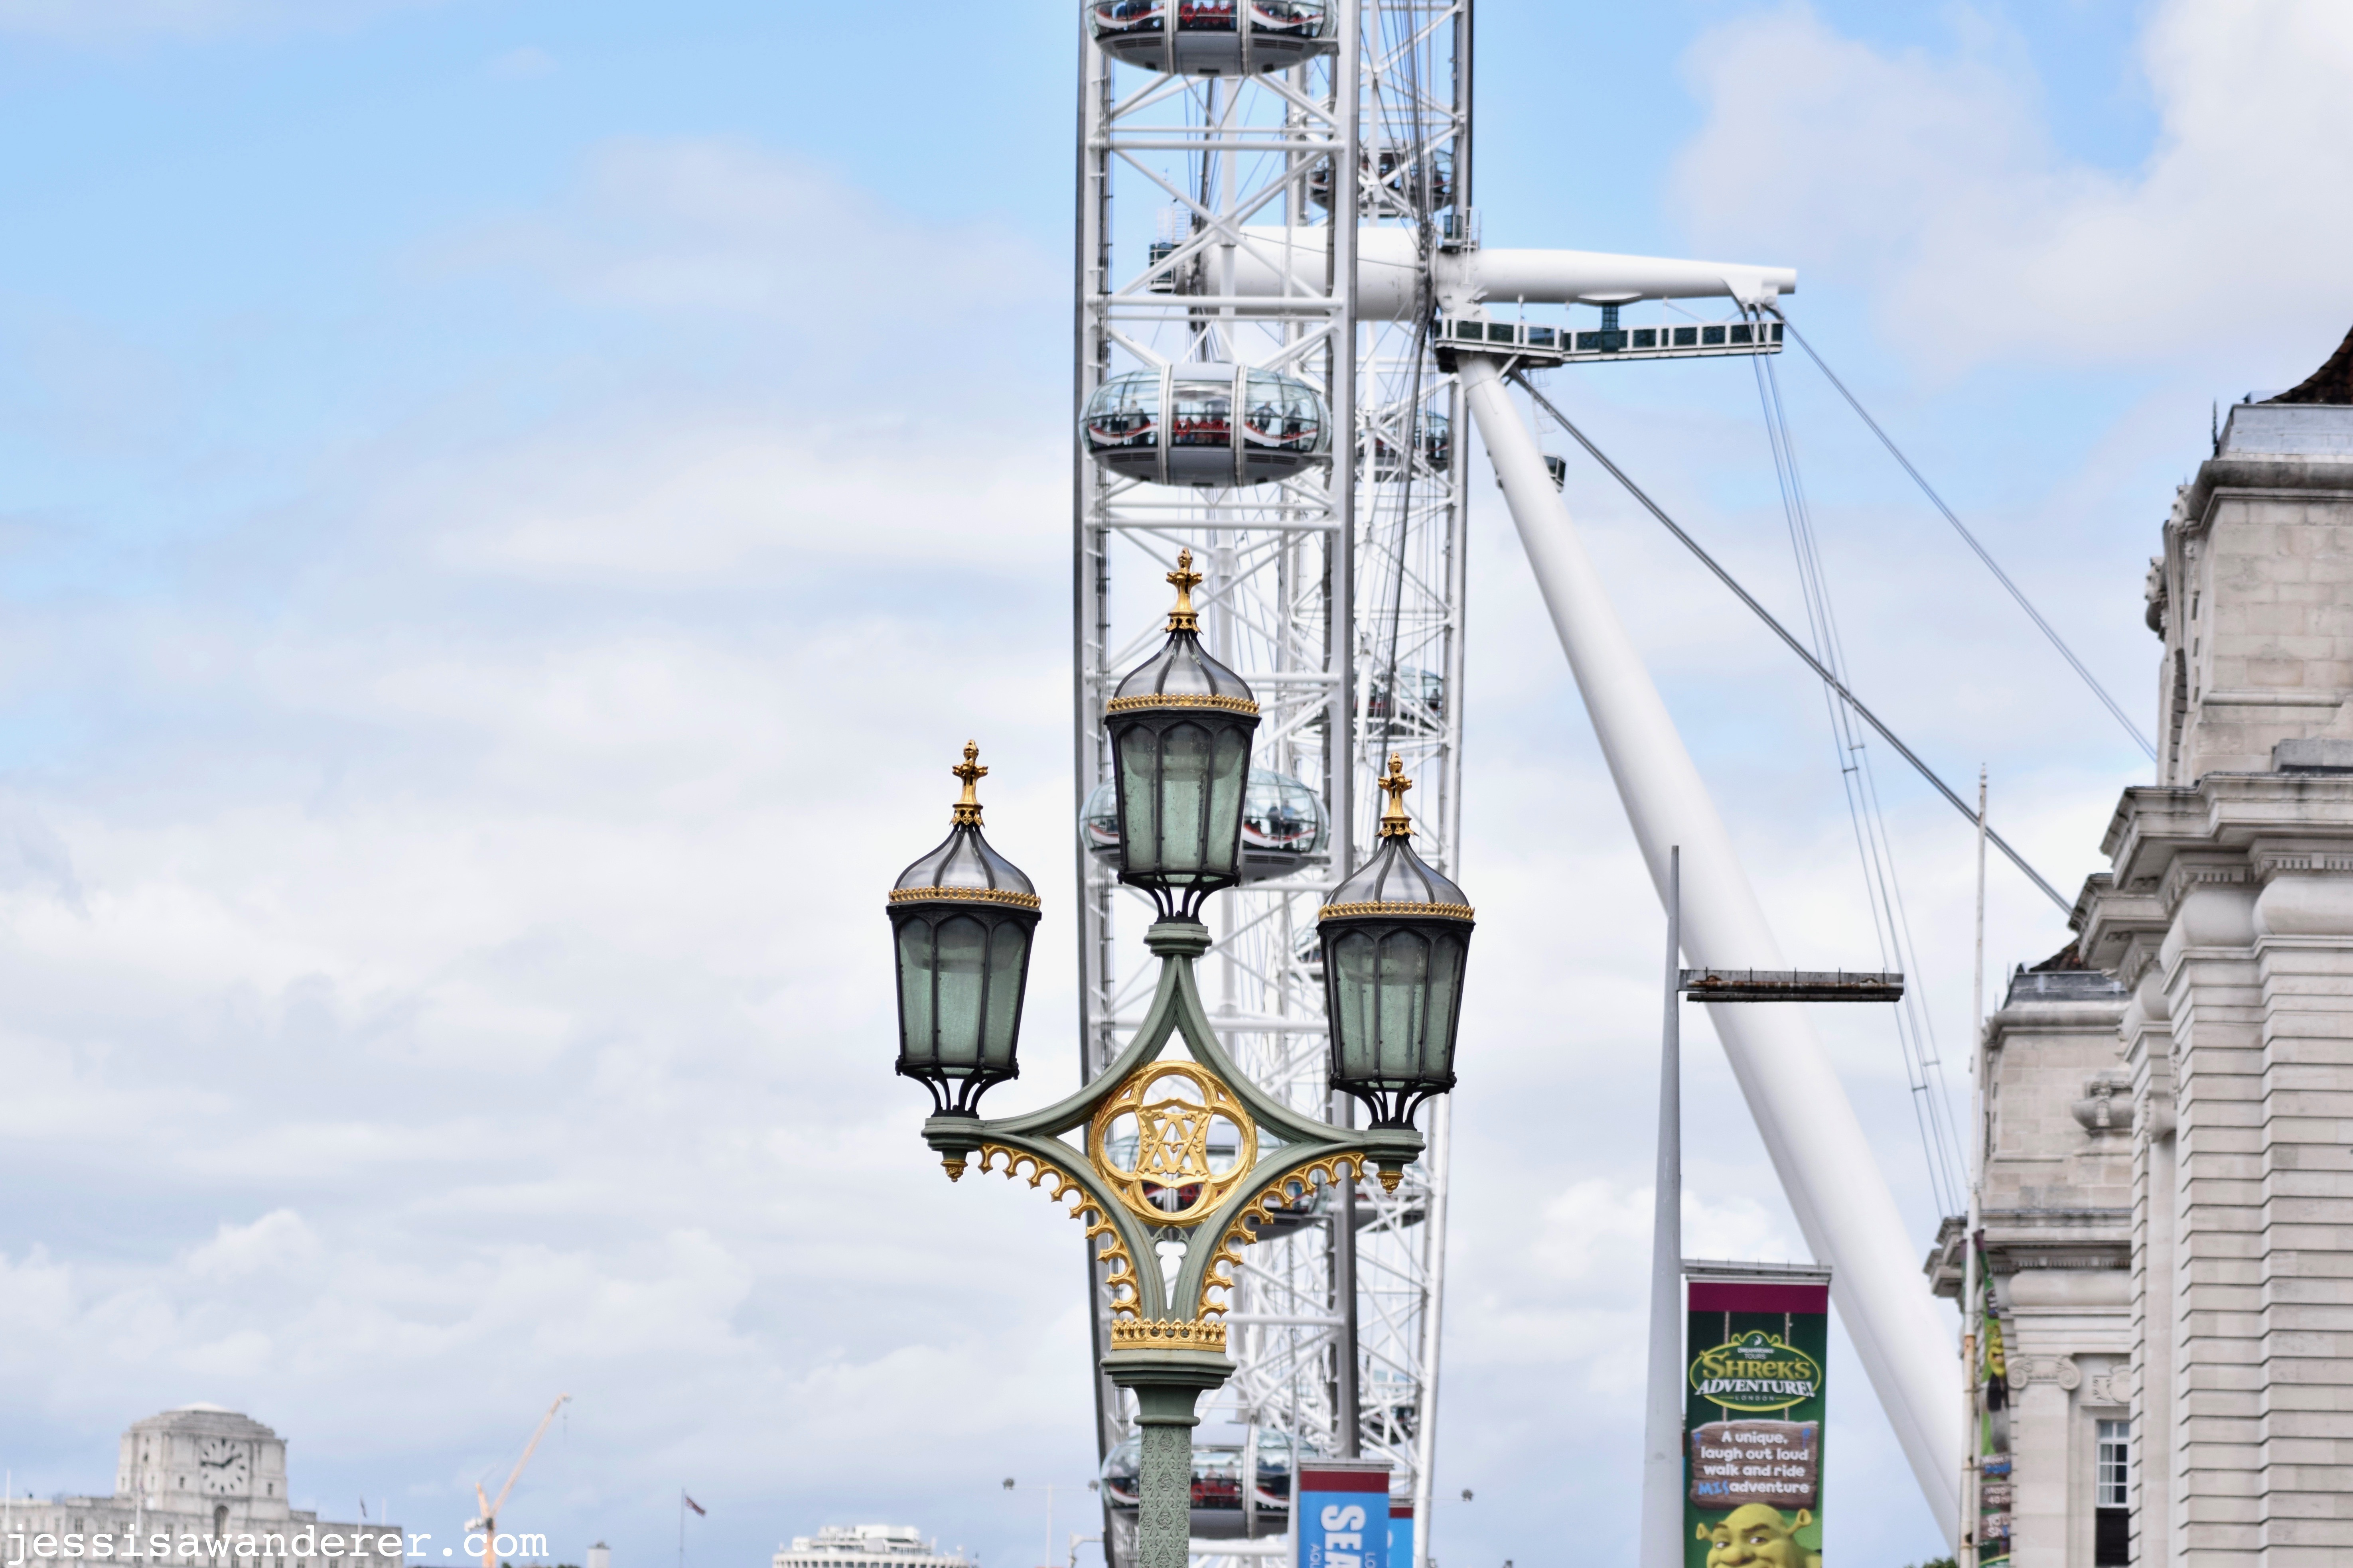 London Eye from Westminster Bridge